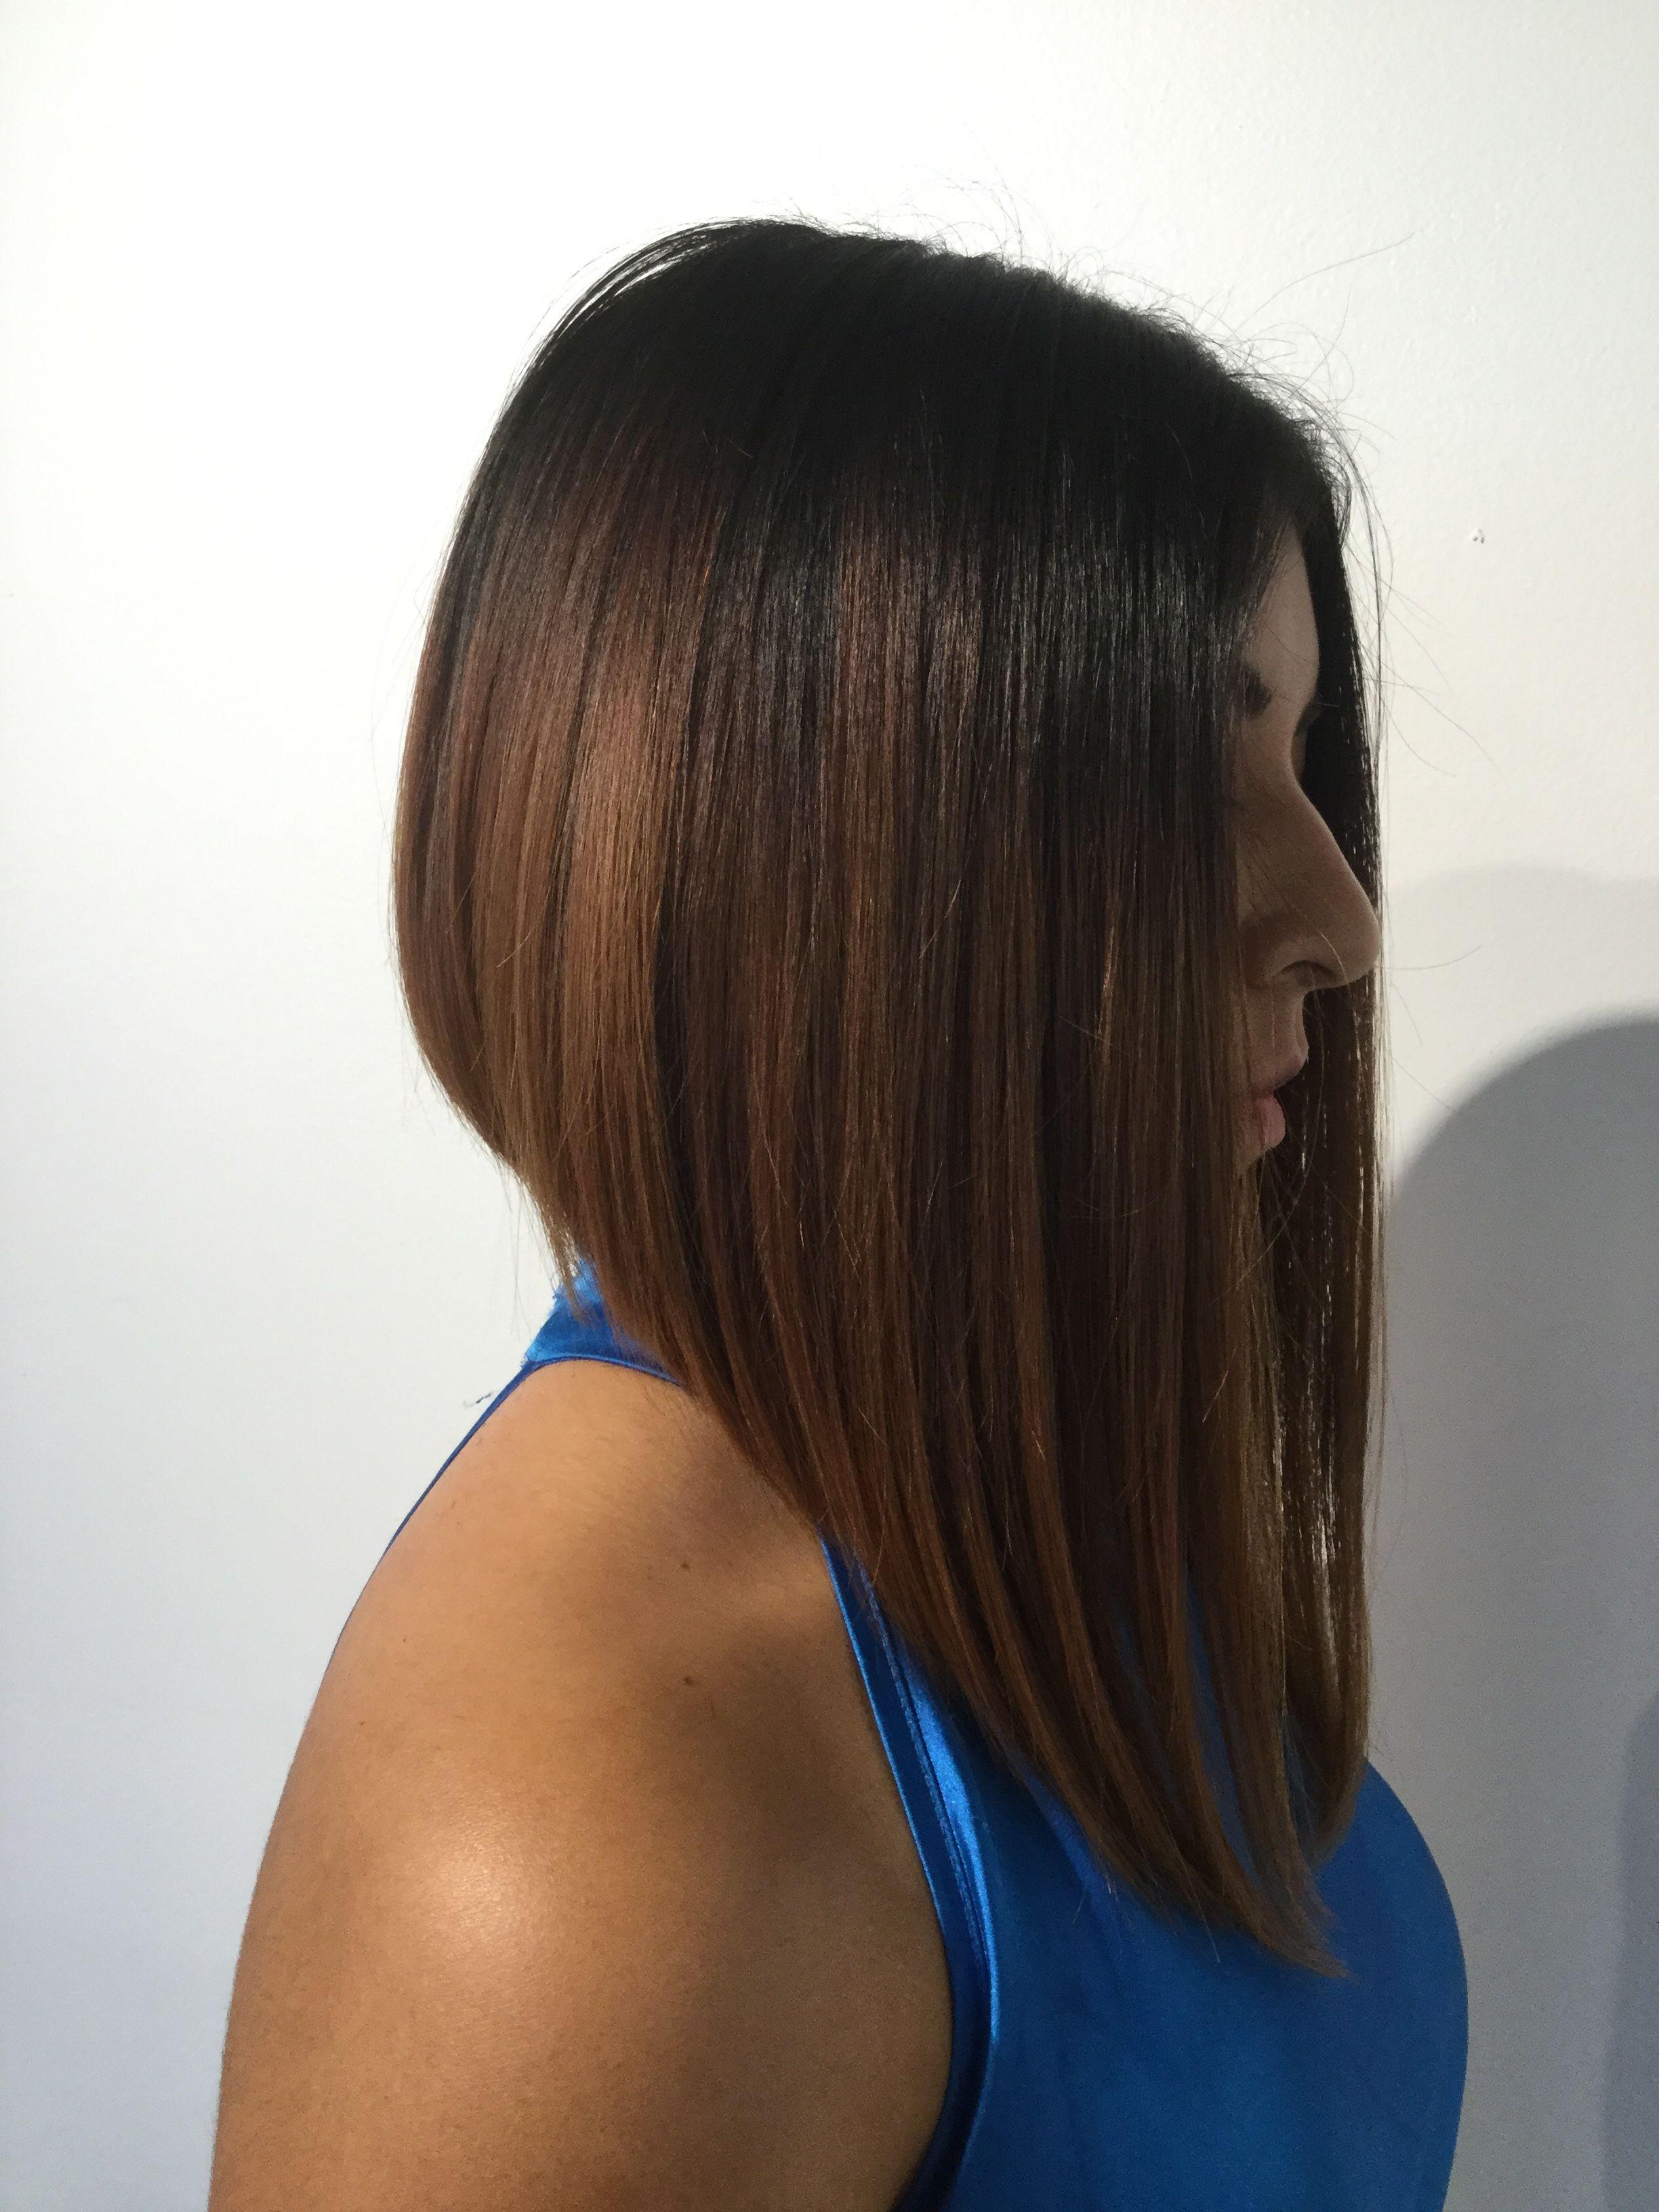 Dramatic Long Bob. Short To Long Haircut. Lob Haircut. Edgy Hair Cut pertaining to Dramatic Short Hairstyles